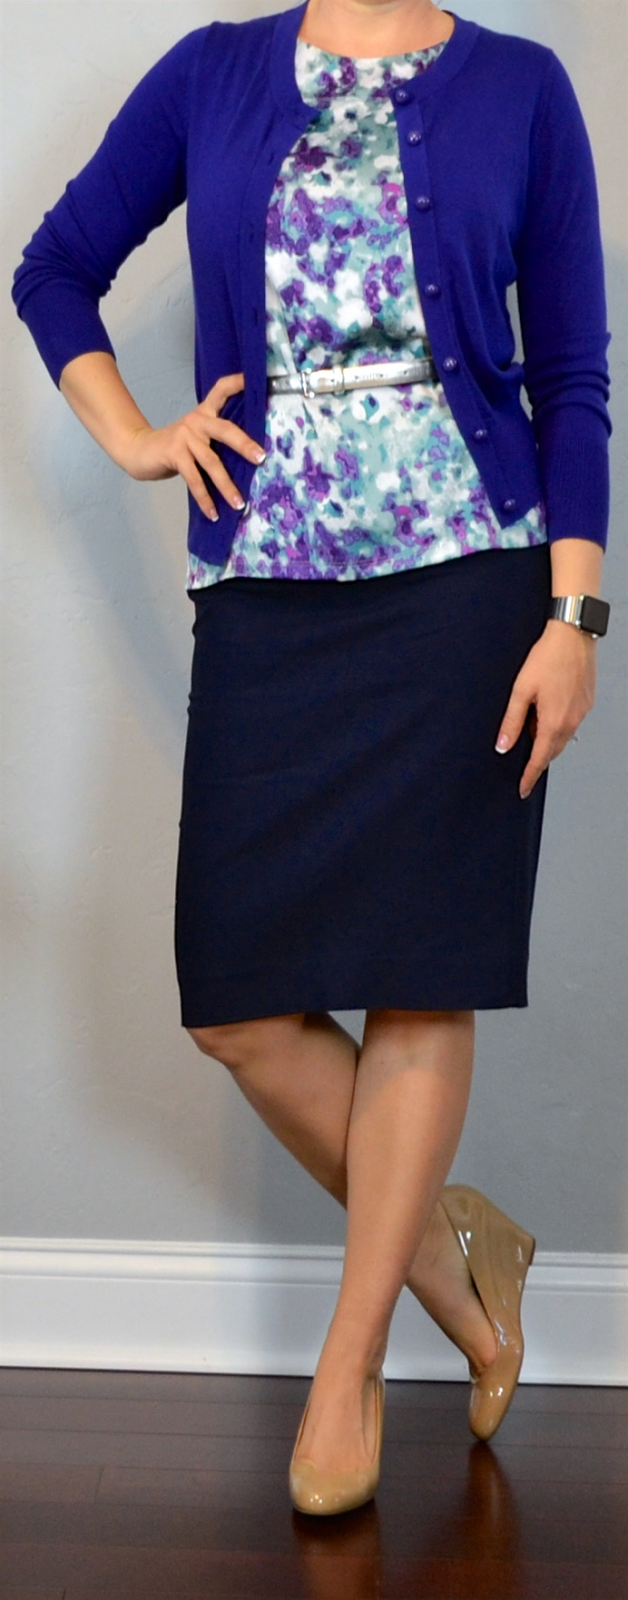 ea38a-purplecardigannavypencil